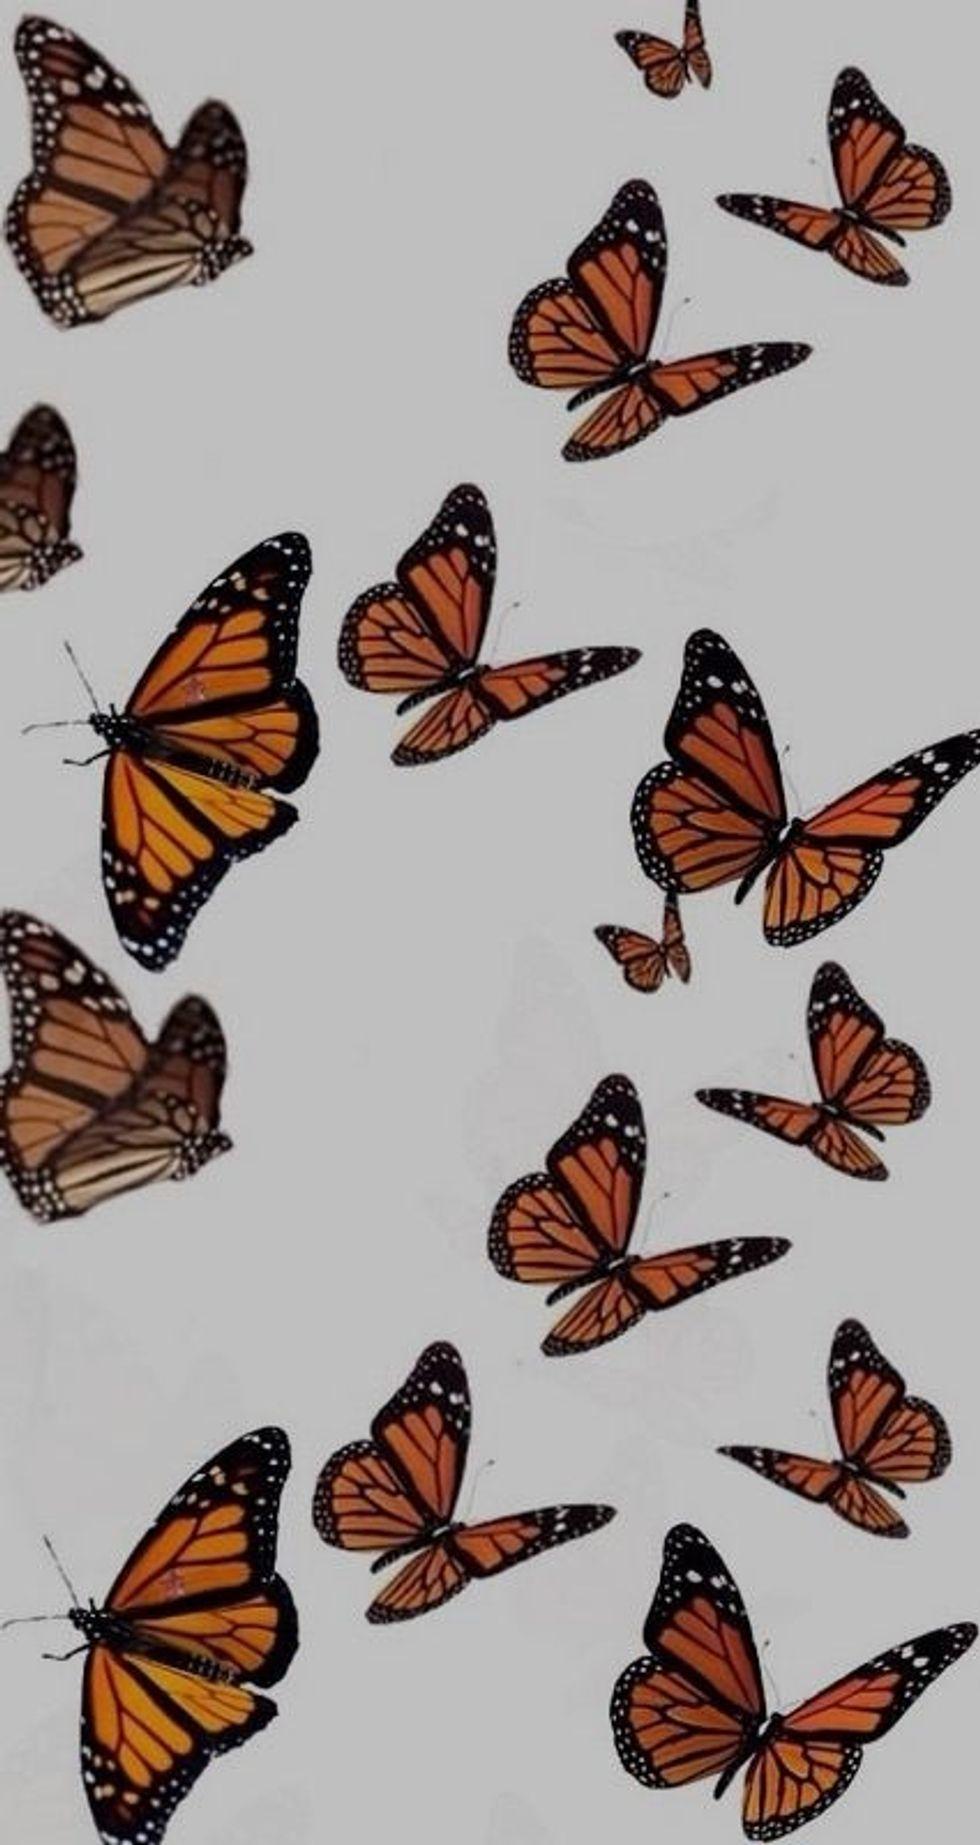 The Metamorphosis: A Poem About My Mental Evolution